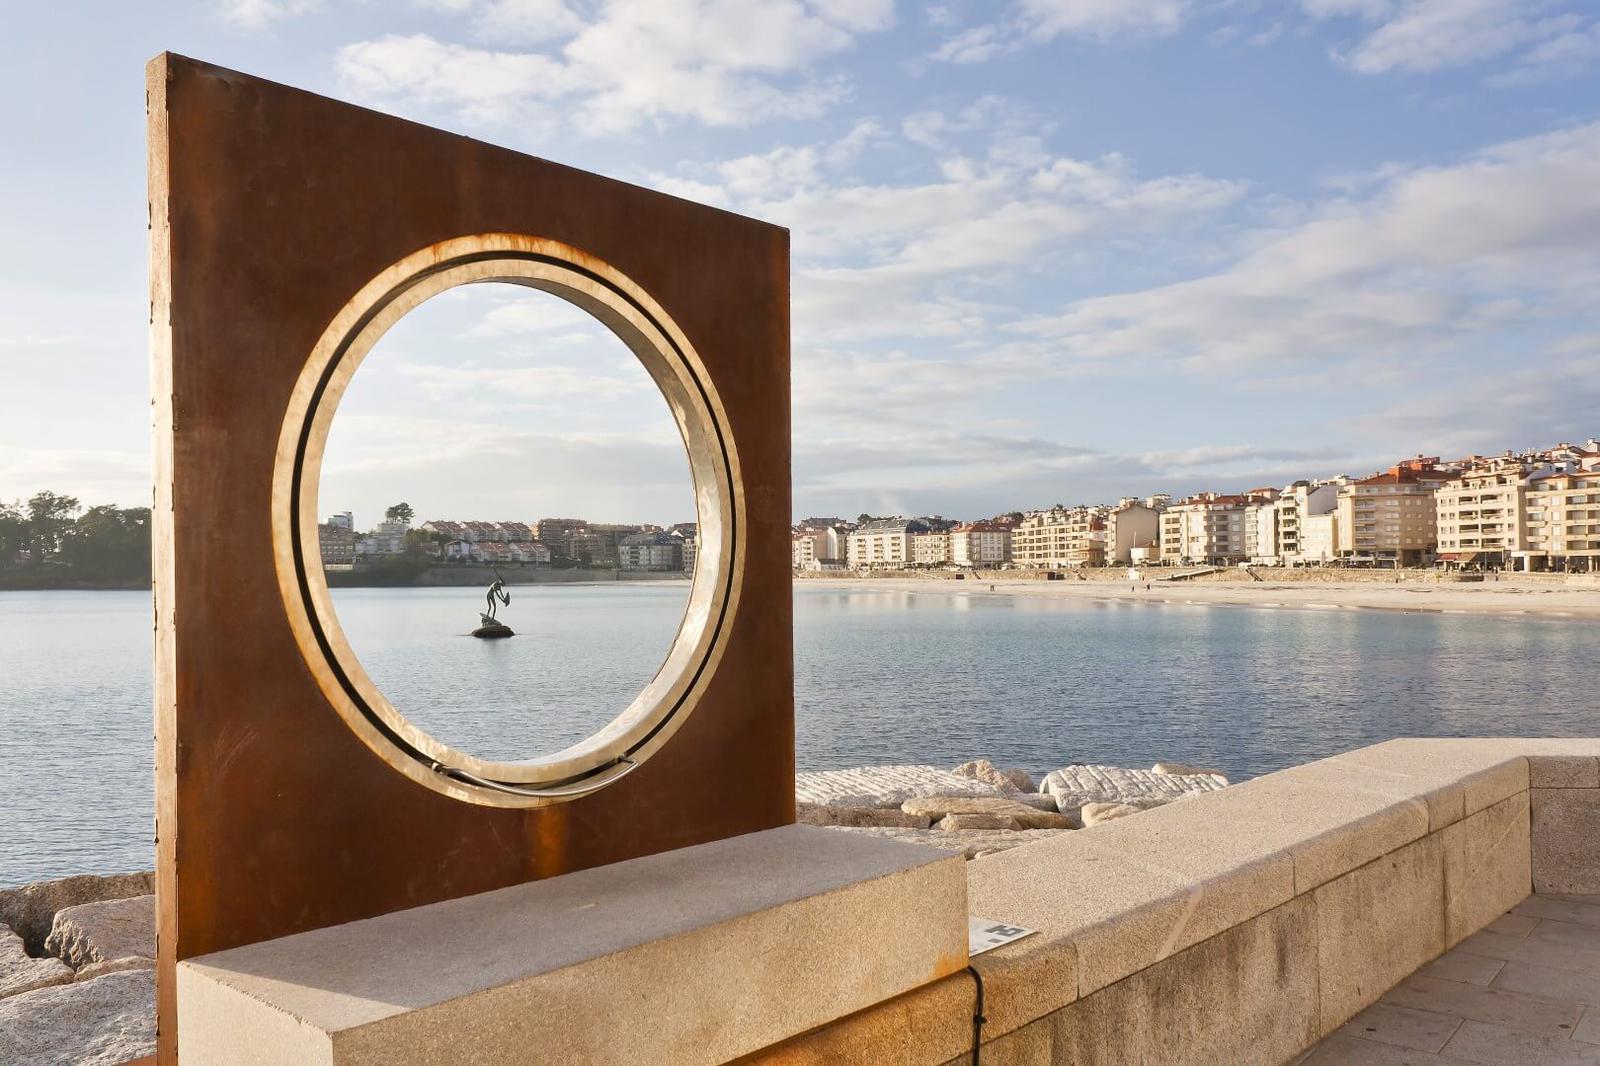 destinos de playa más baratos Spain_Sanxenxo_Fotolia